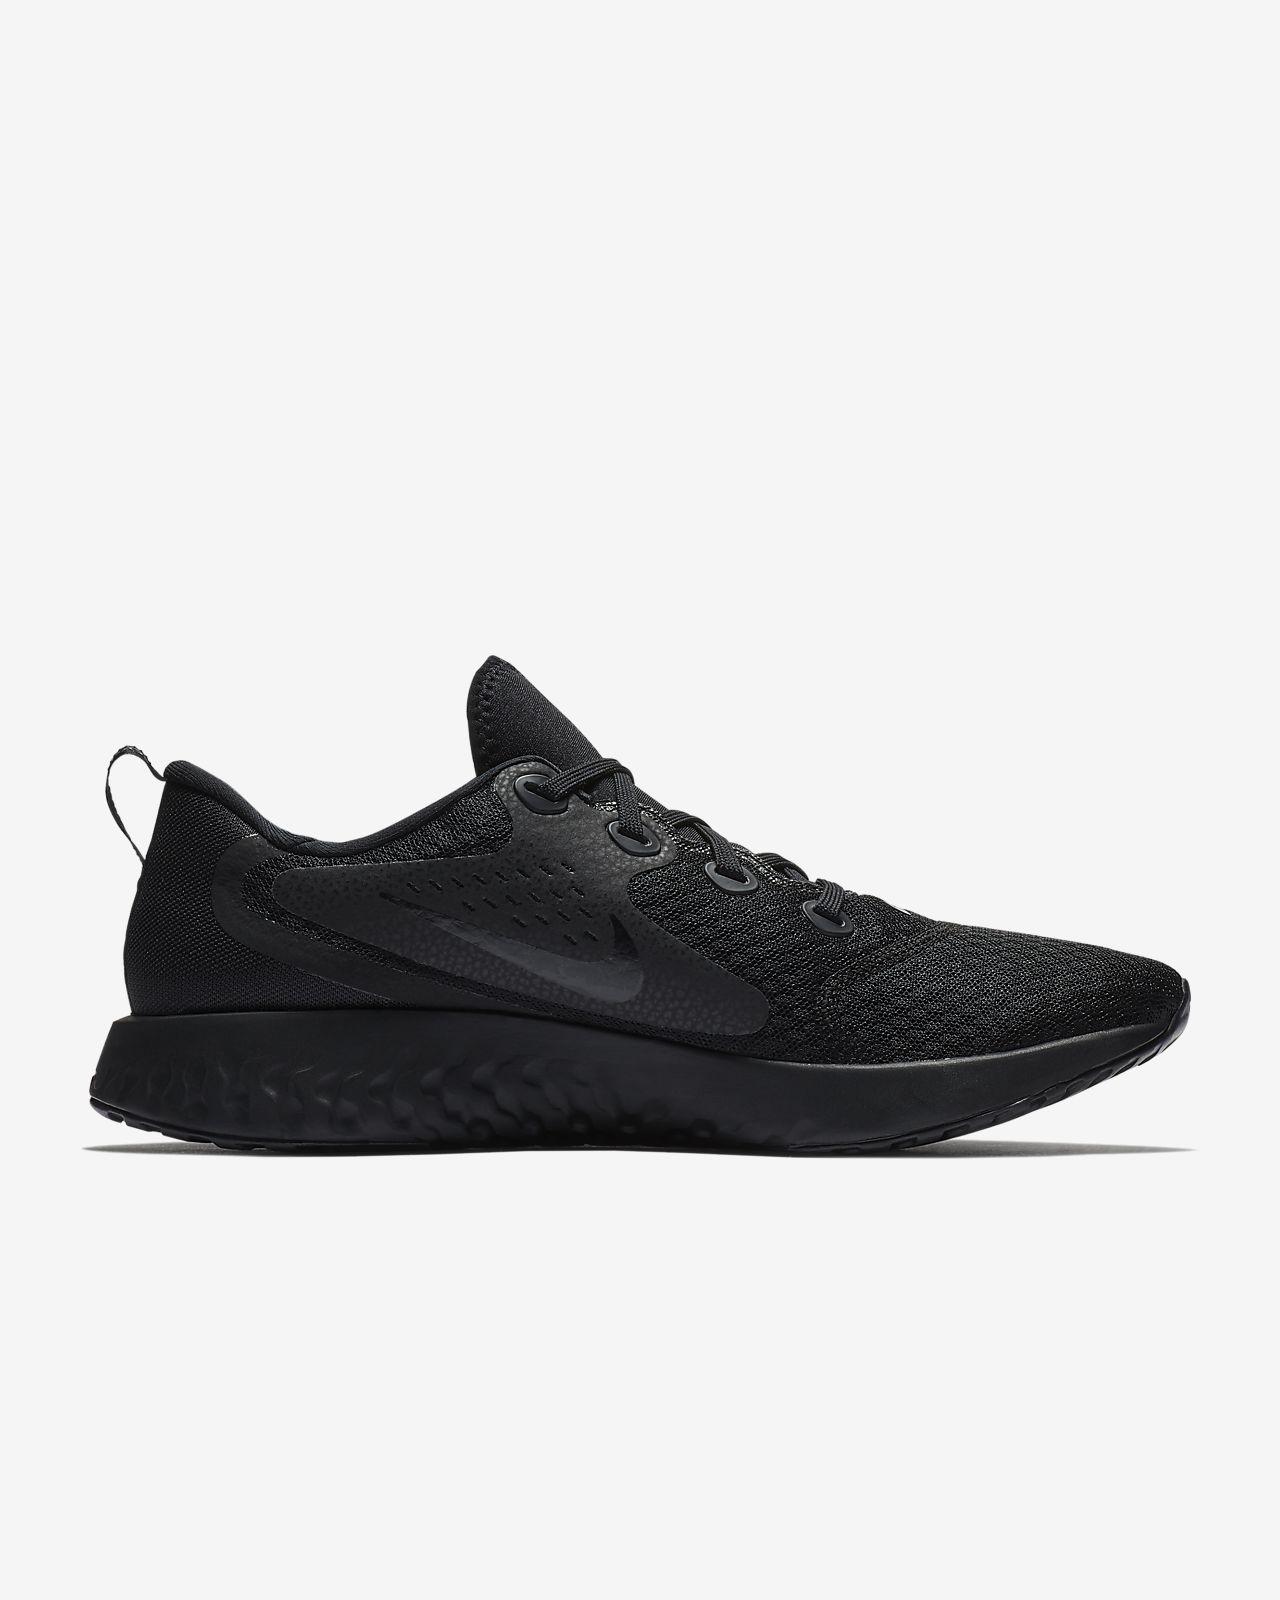 sale retailer ae75d c2bb2 ... Nike Legend React Men s Running Shoe